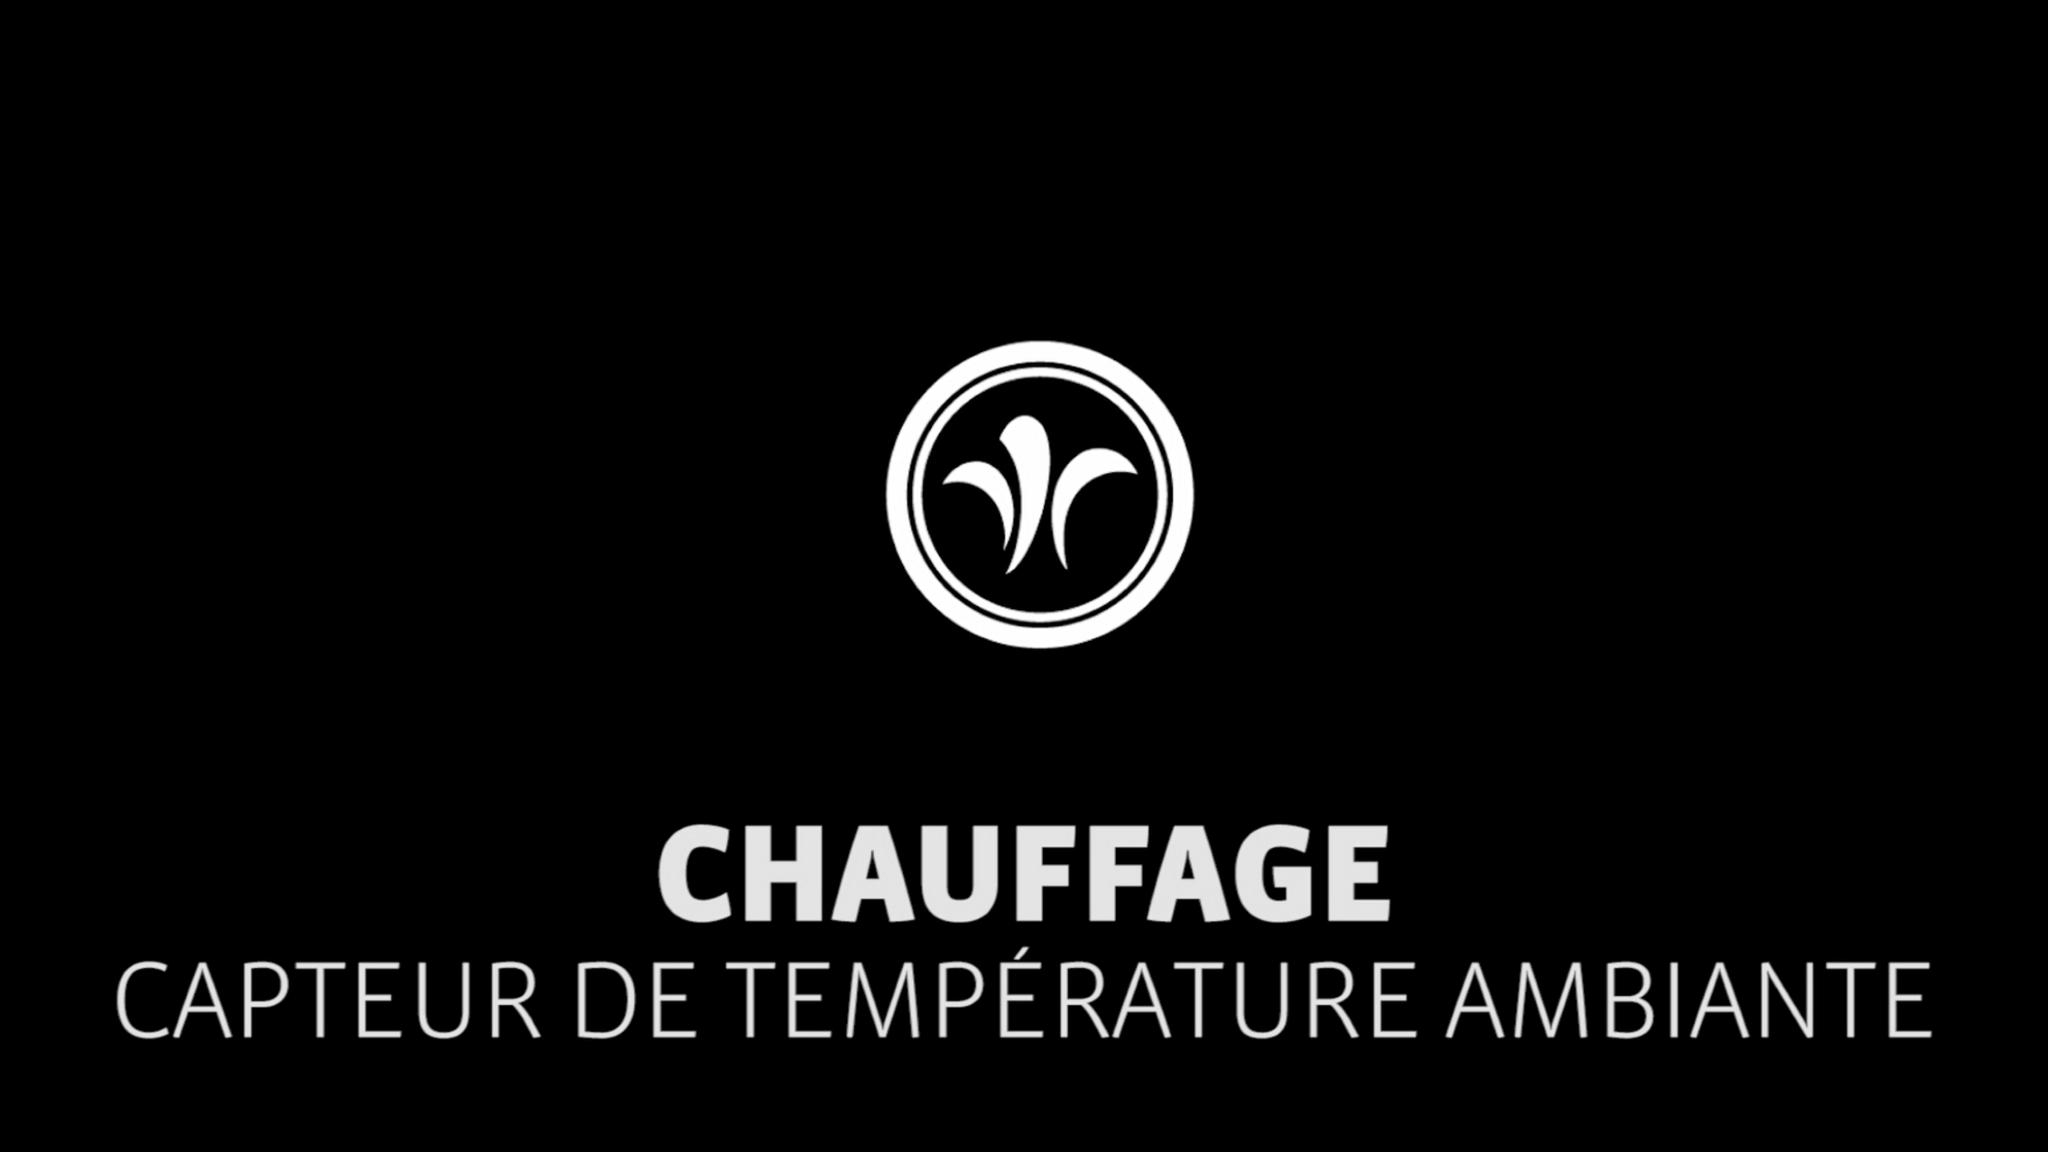 Sonde de température ambiante pour camping-car // Niesmann+Bischoff-Camping-car (ARTO) // 2019 // H1